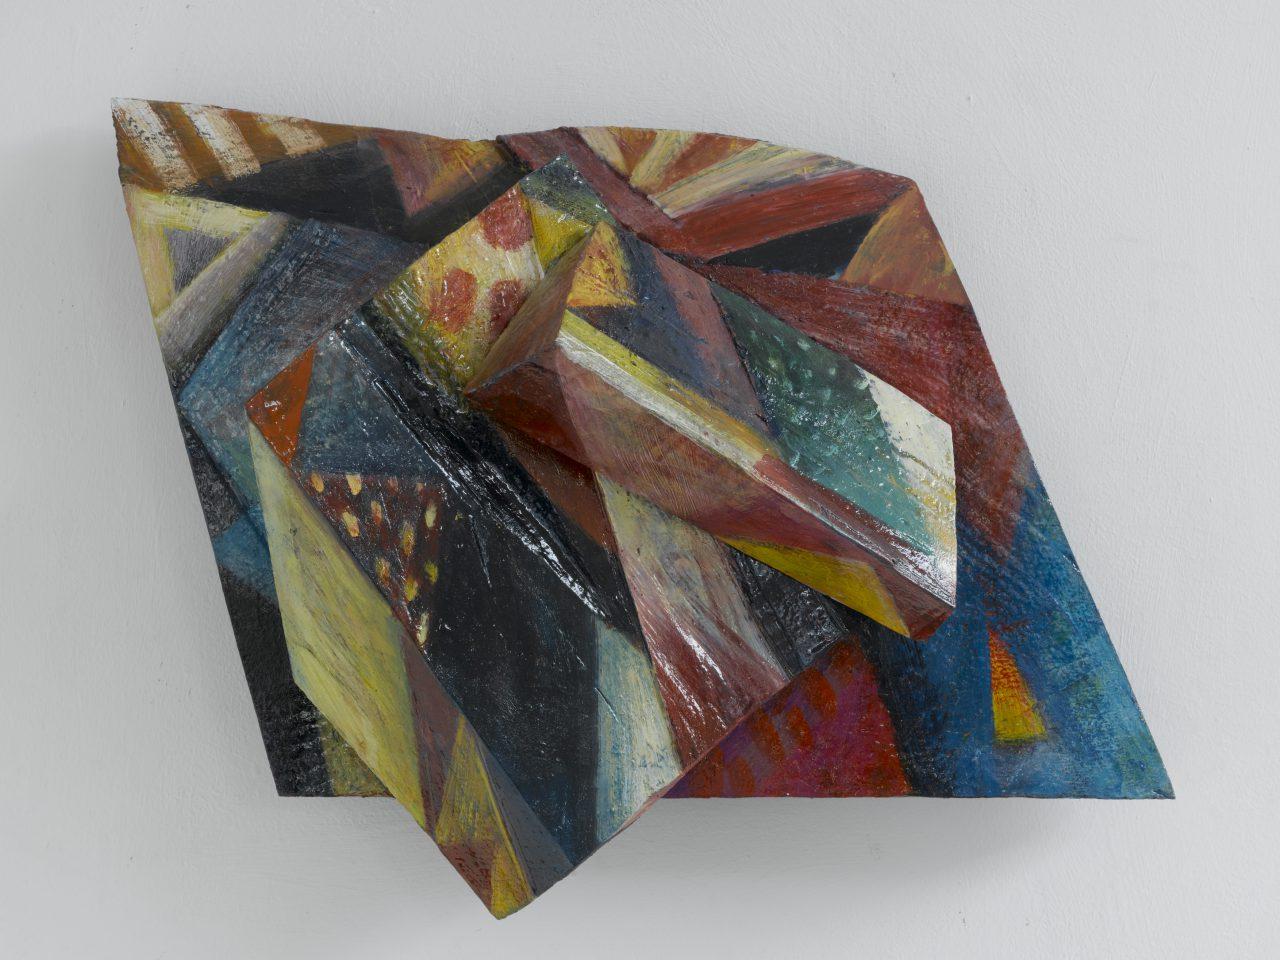 HILLE, 2004 - 2006, Harzöl-Tempera auf Holz, 34 x 40 x 14 cm